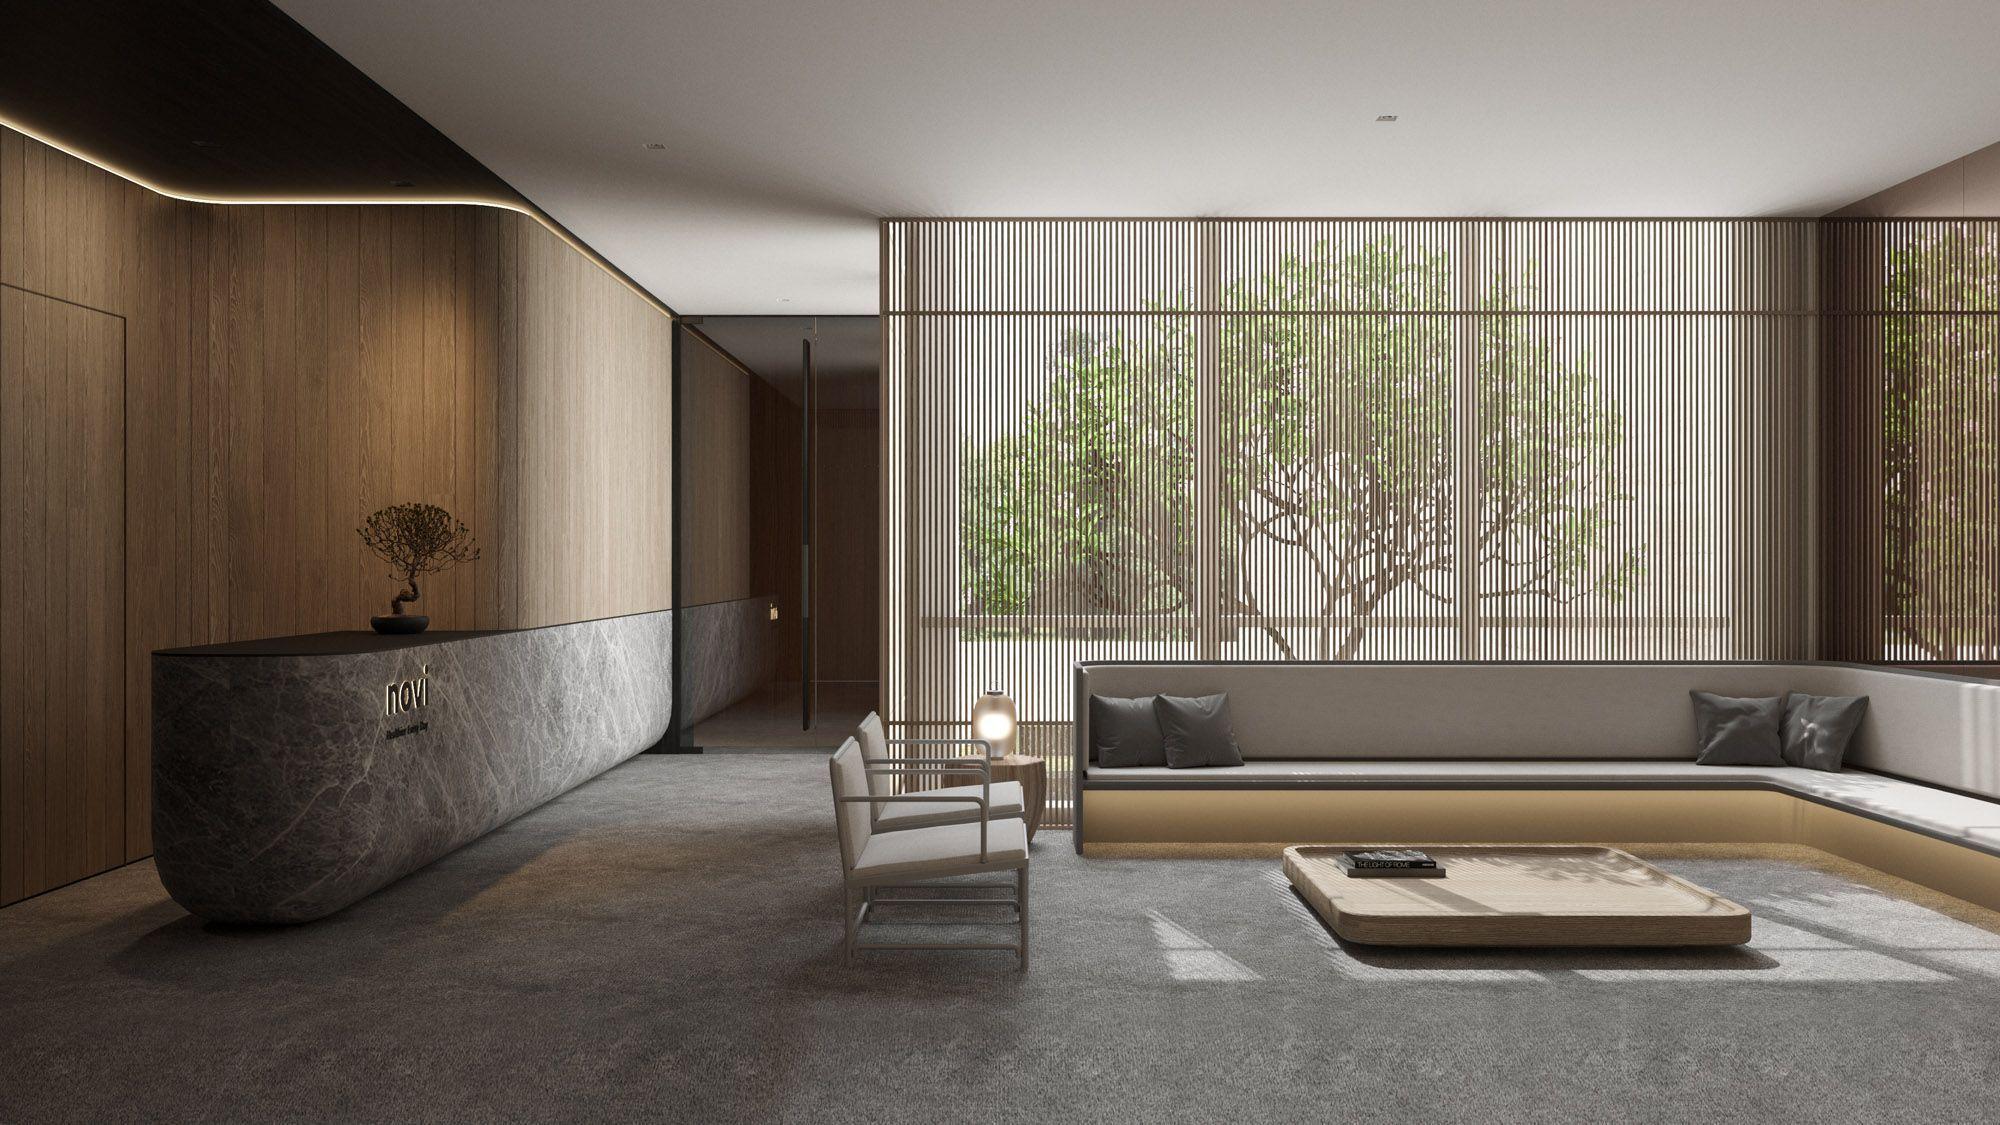 0932 Singapur Architektur Und Interior Design Architektur Design Interior Officeinteriordesignlobby Si With Images Hotel Lobby Design Space Interiors Lobby Design